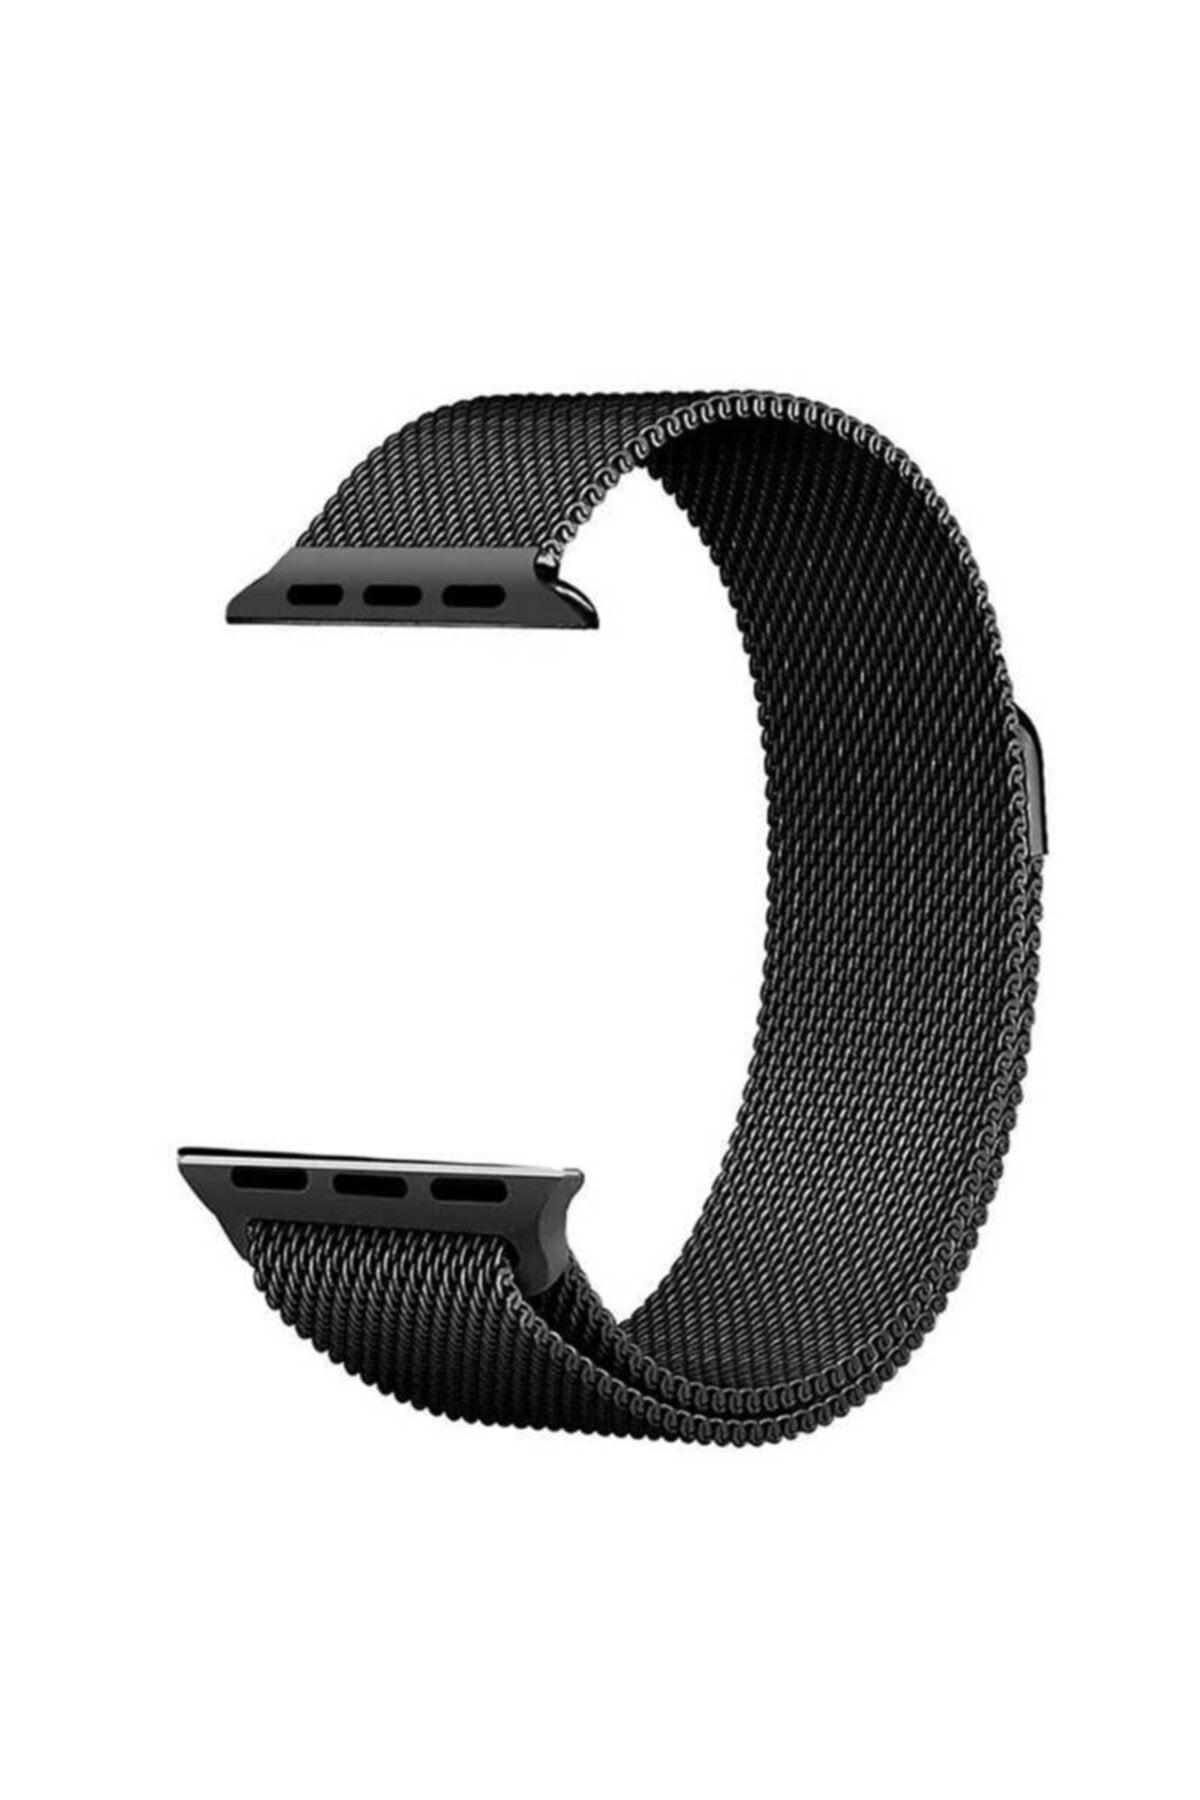 zore Apple Watch 40mm Krd-01 Metal Kordon Siyah 1